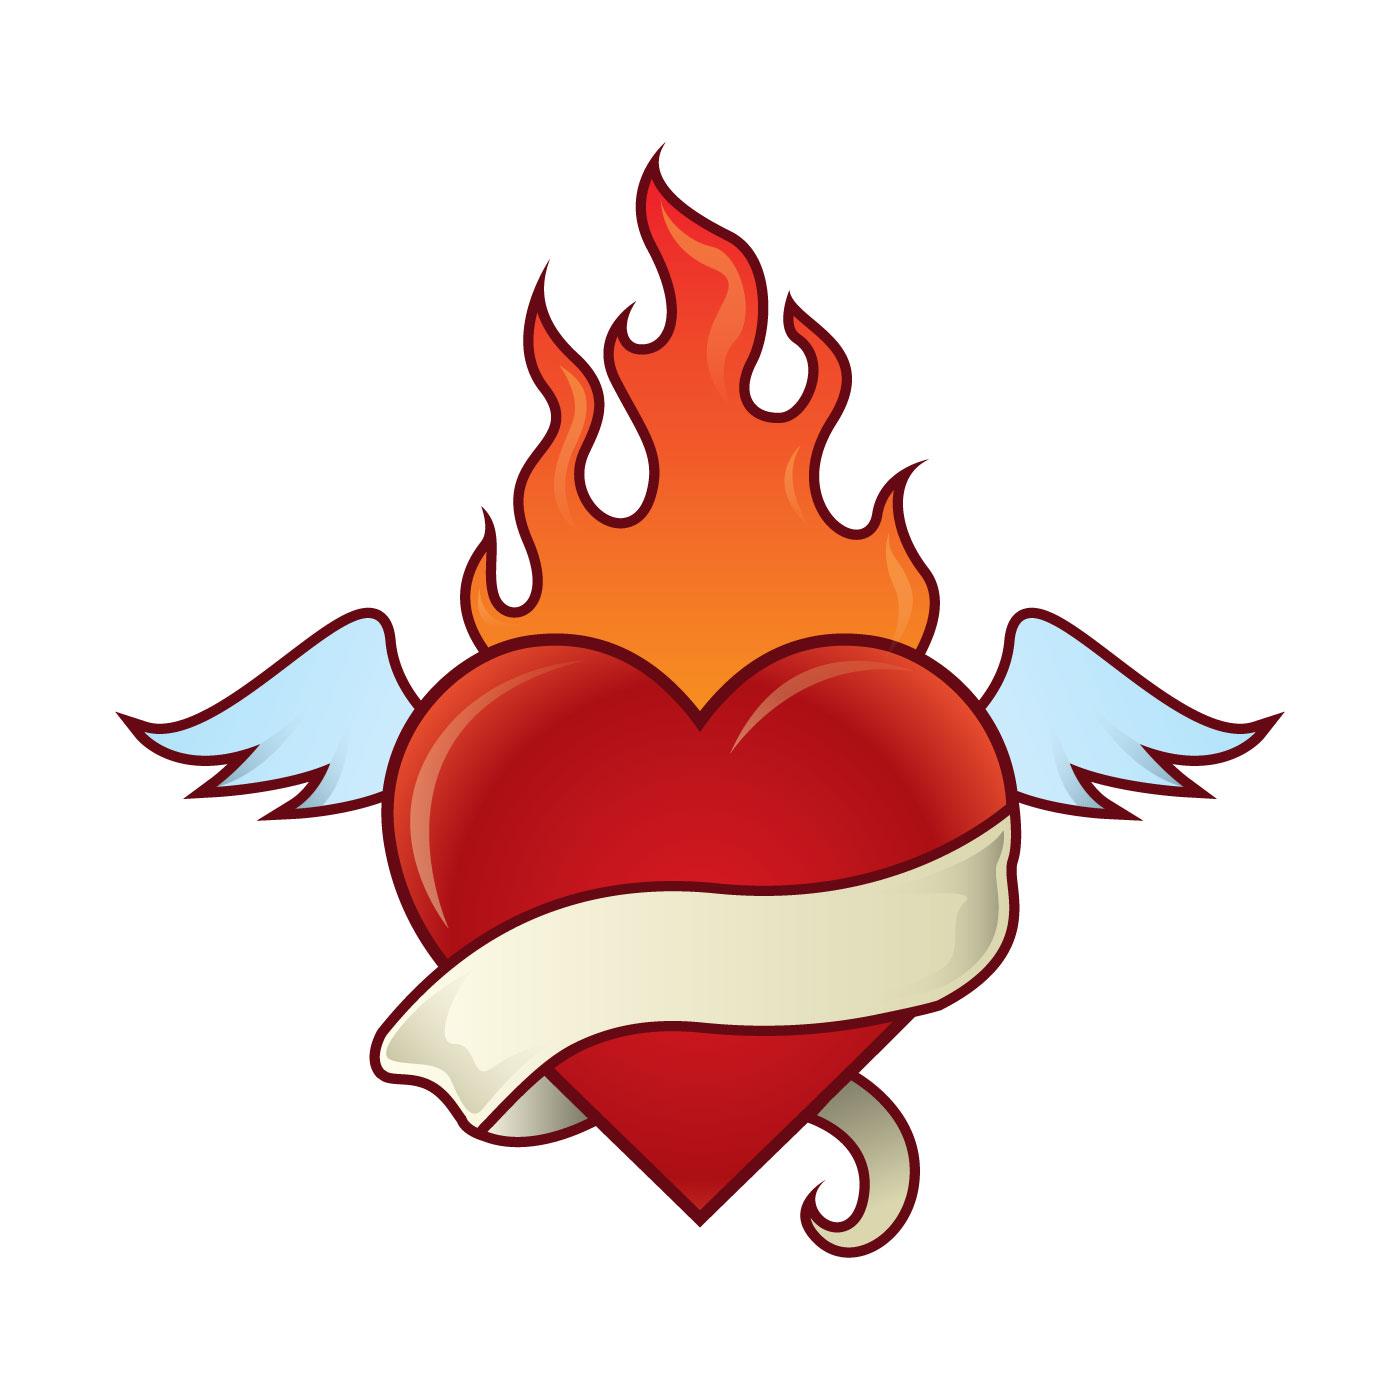 Flaming Heart Illustration - Download Free Vectors ...